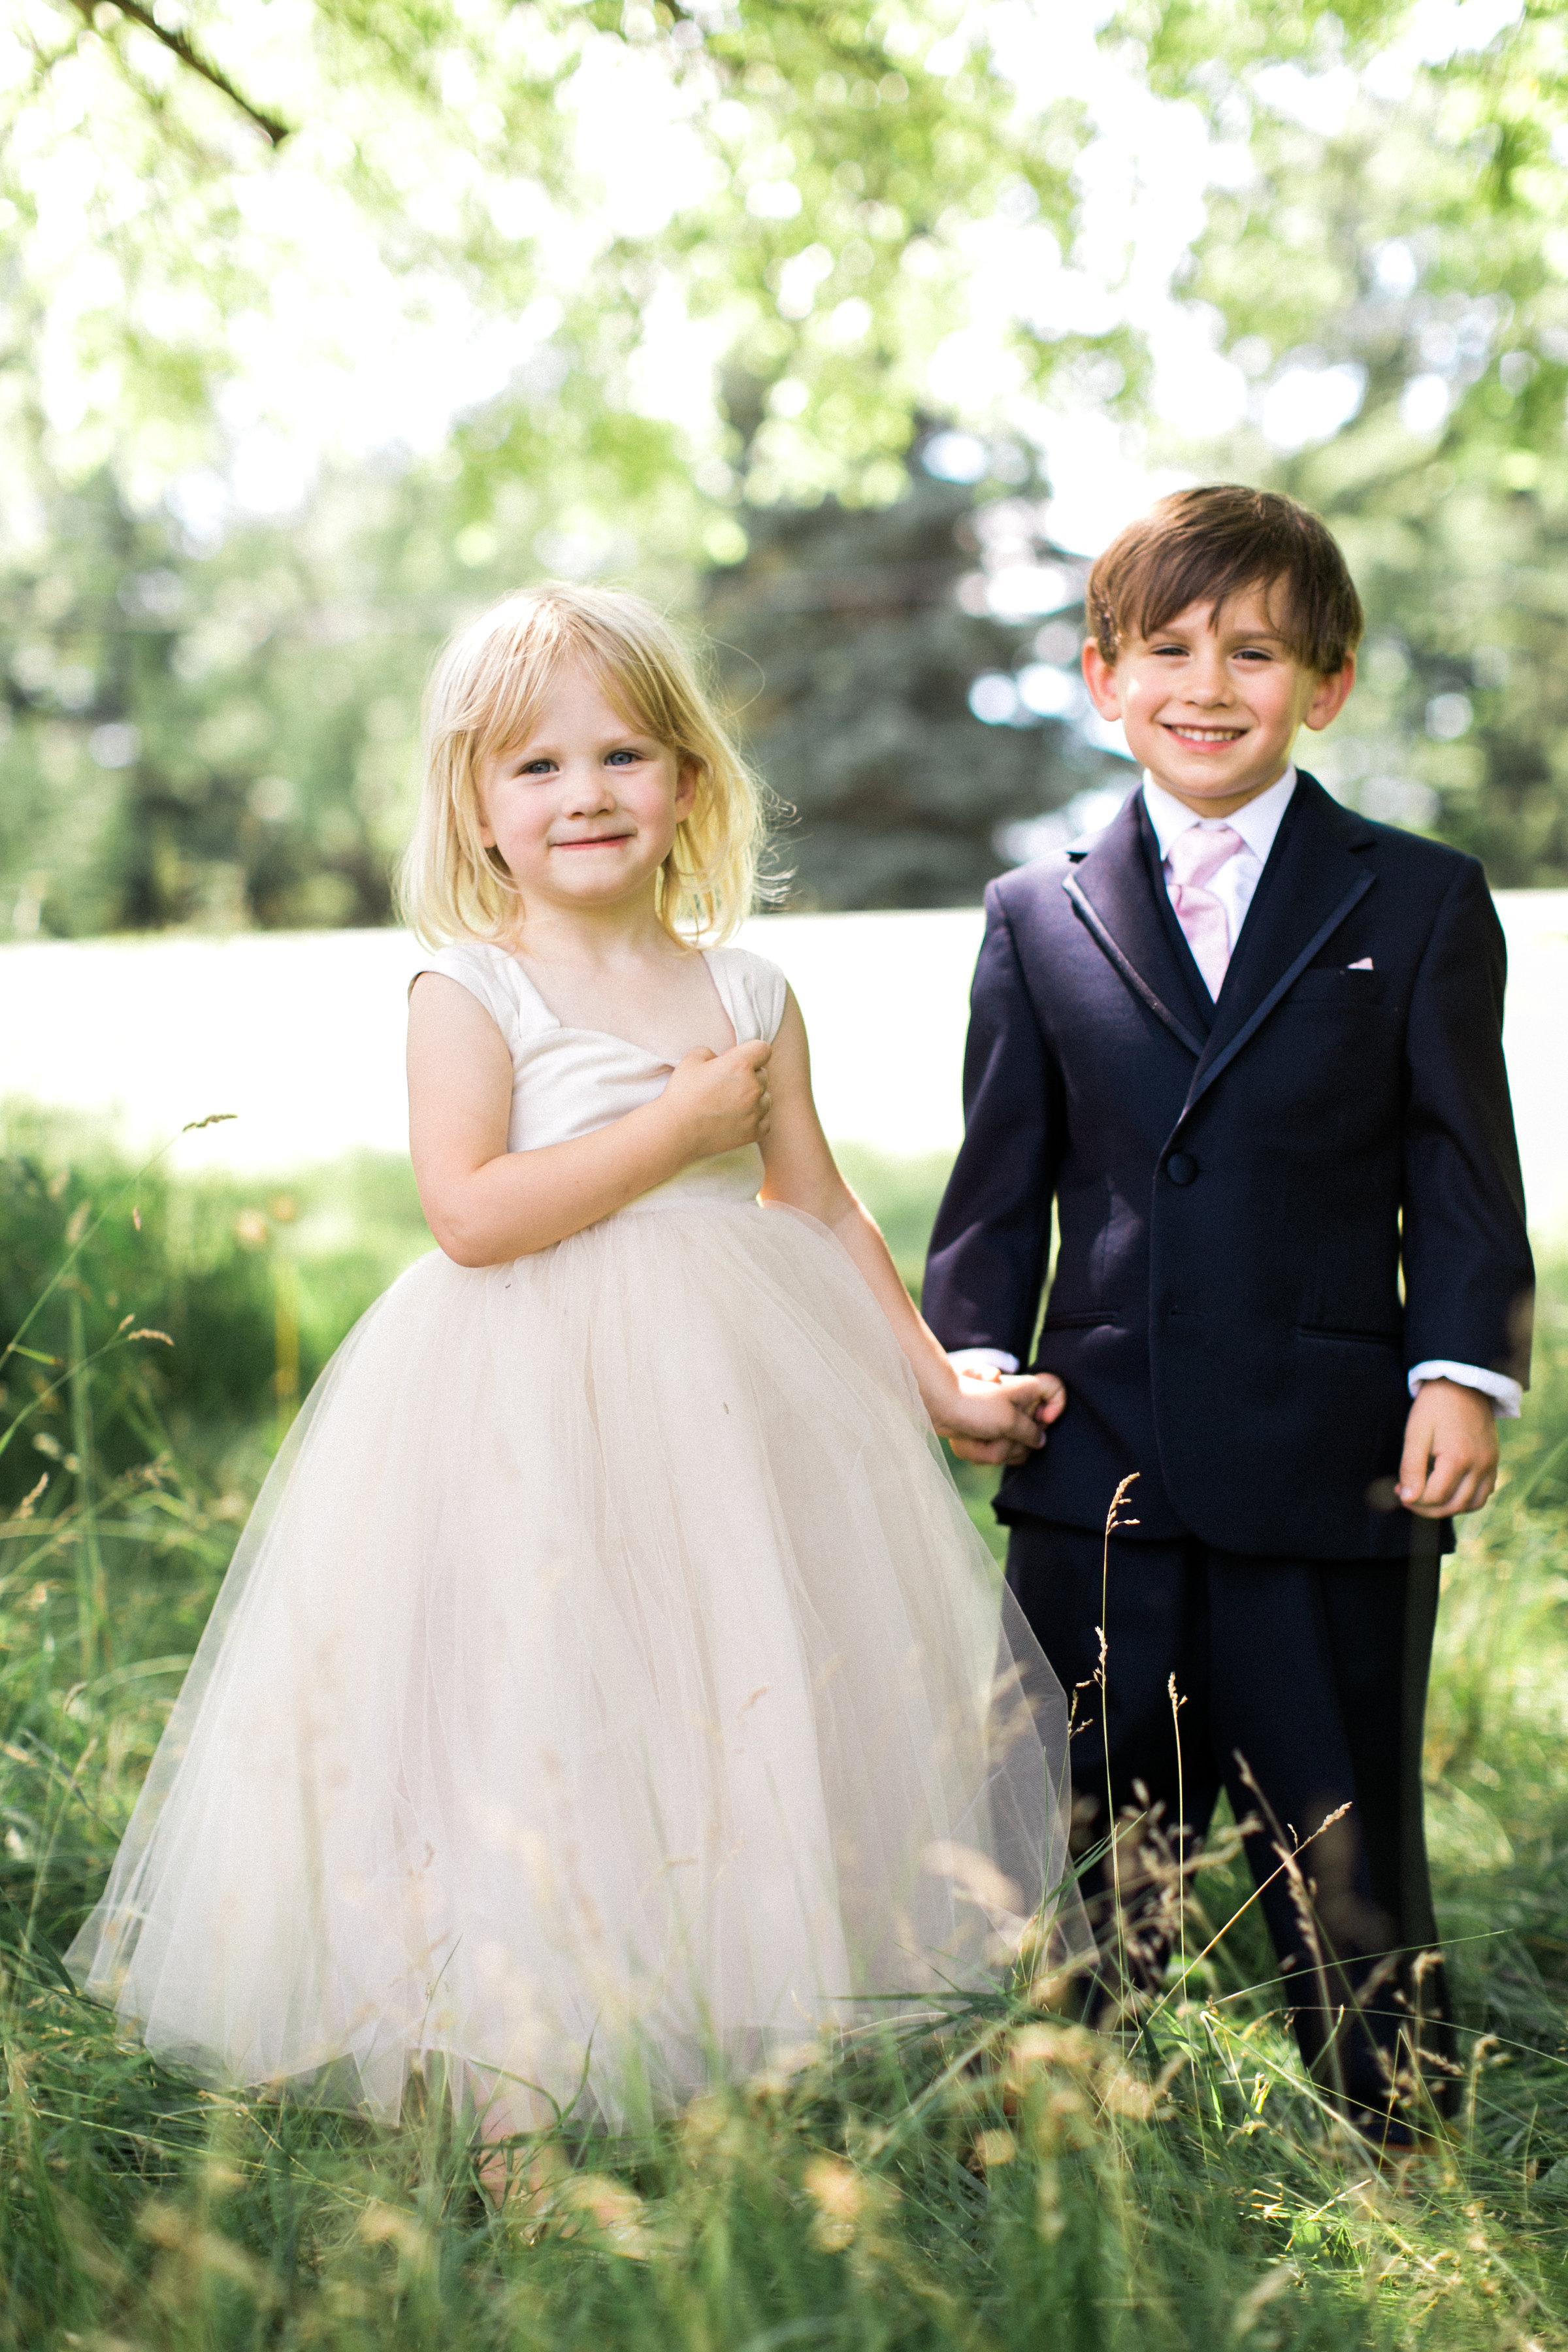 whitney-michael-wedding-256.jpg